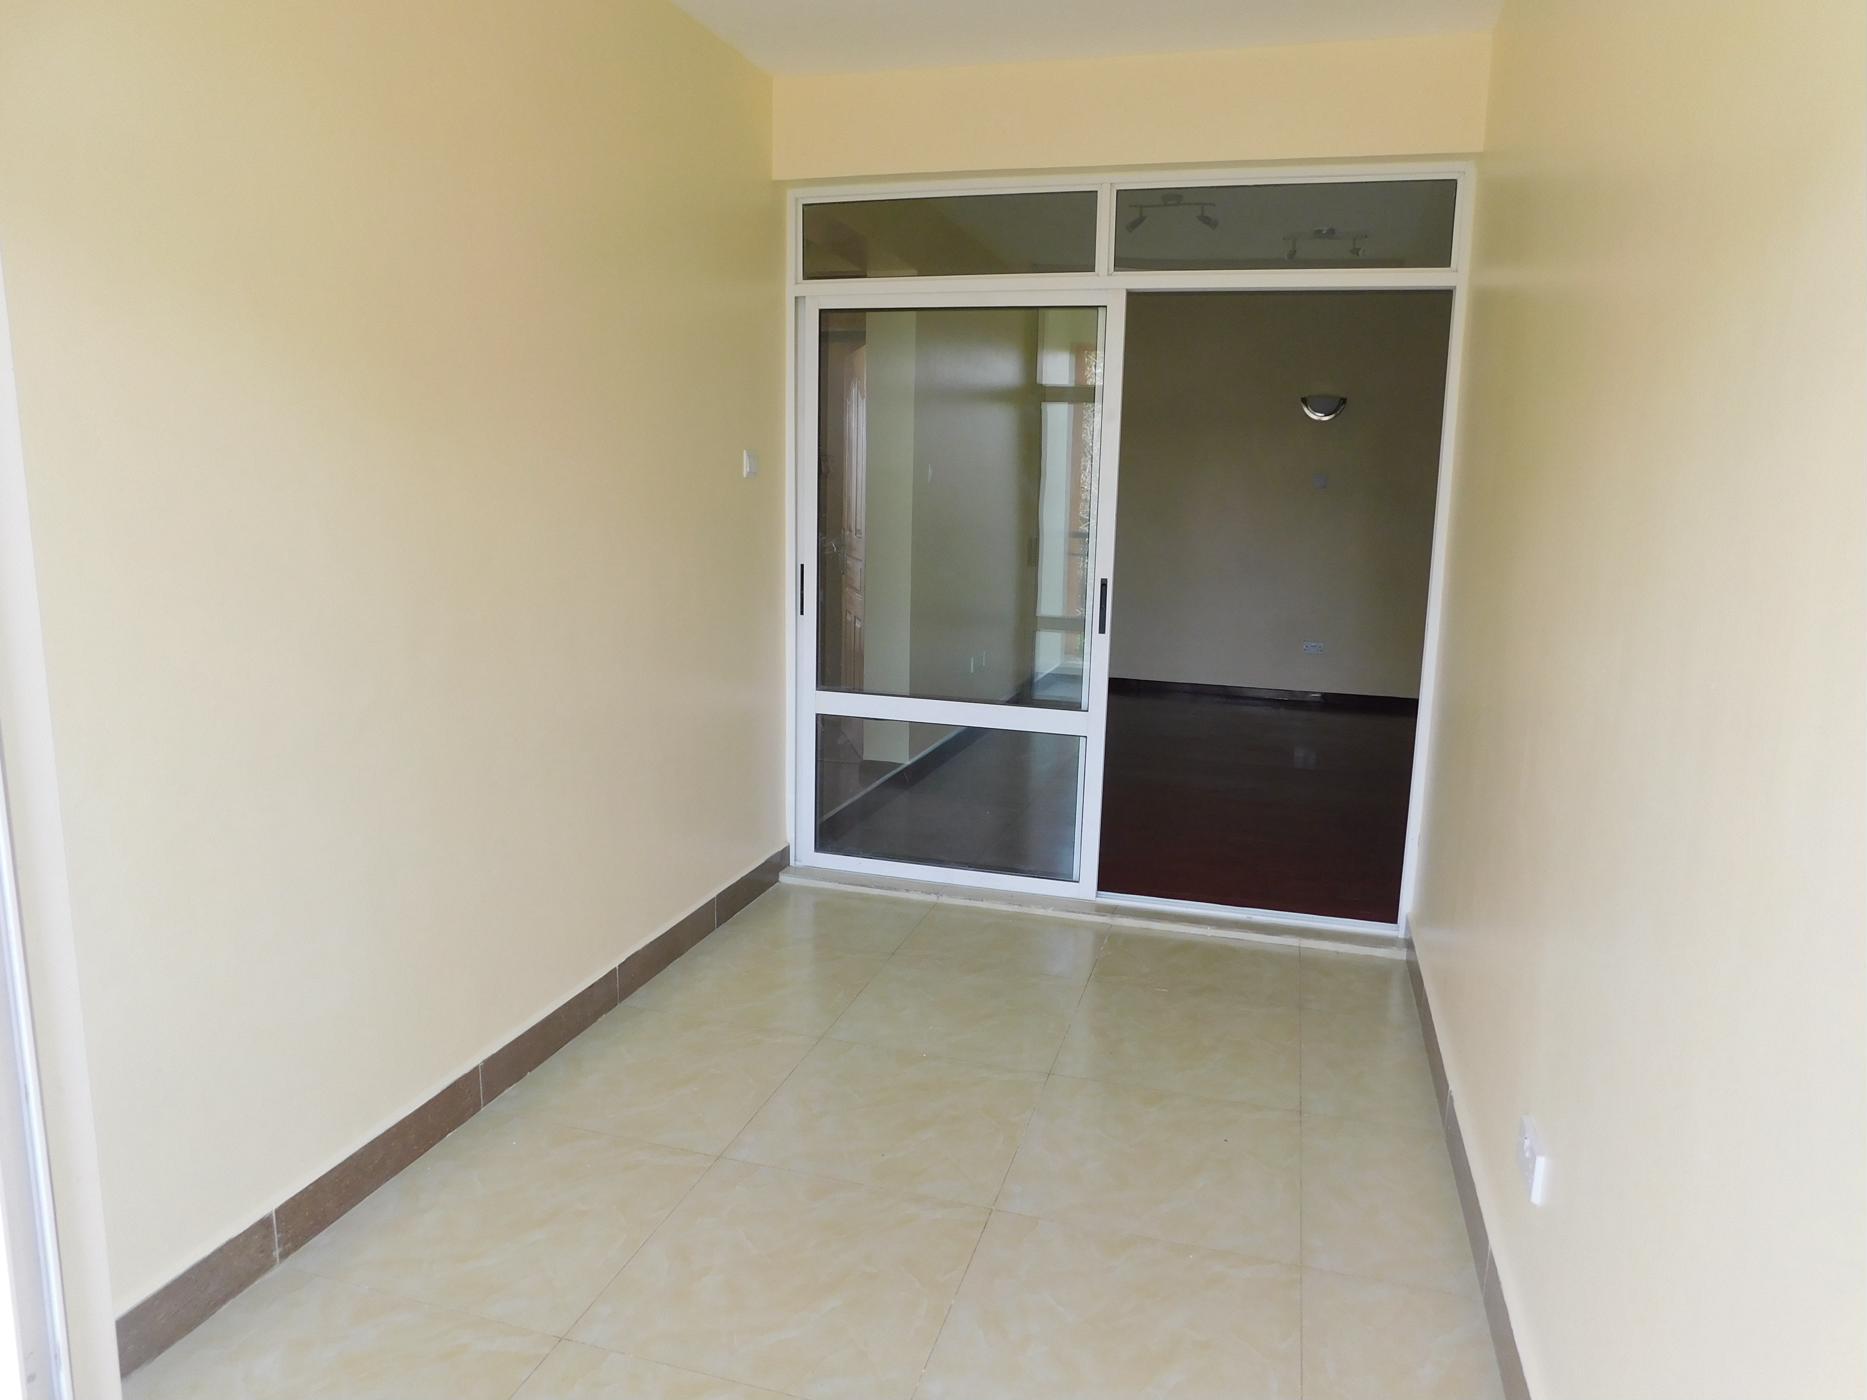 2 bedroom apartment to rent in Lavington (Kenya)